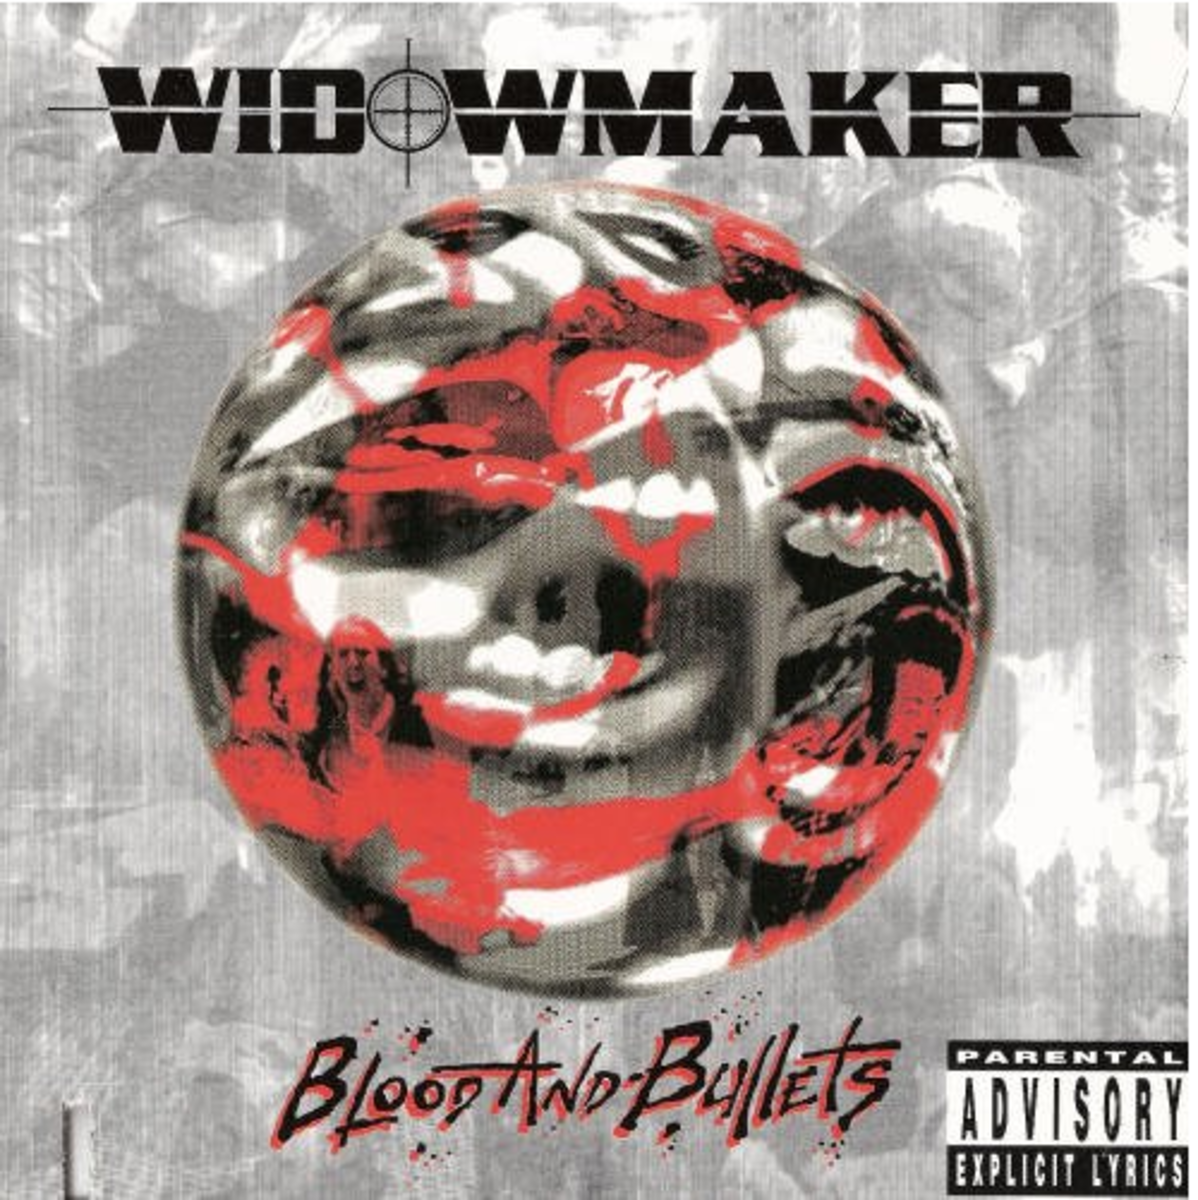 forgotten-hard-rock-albums-widowmaker-blood-and-bullets-1992